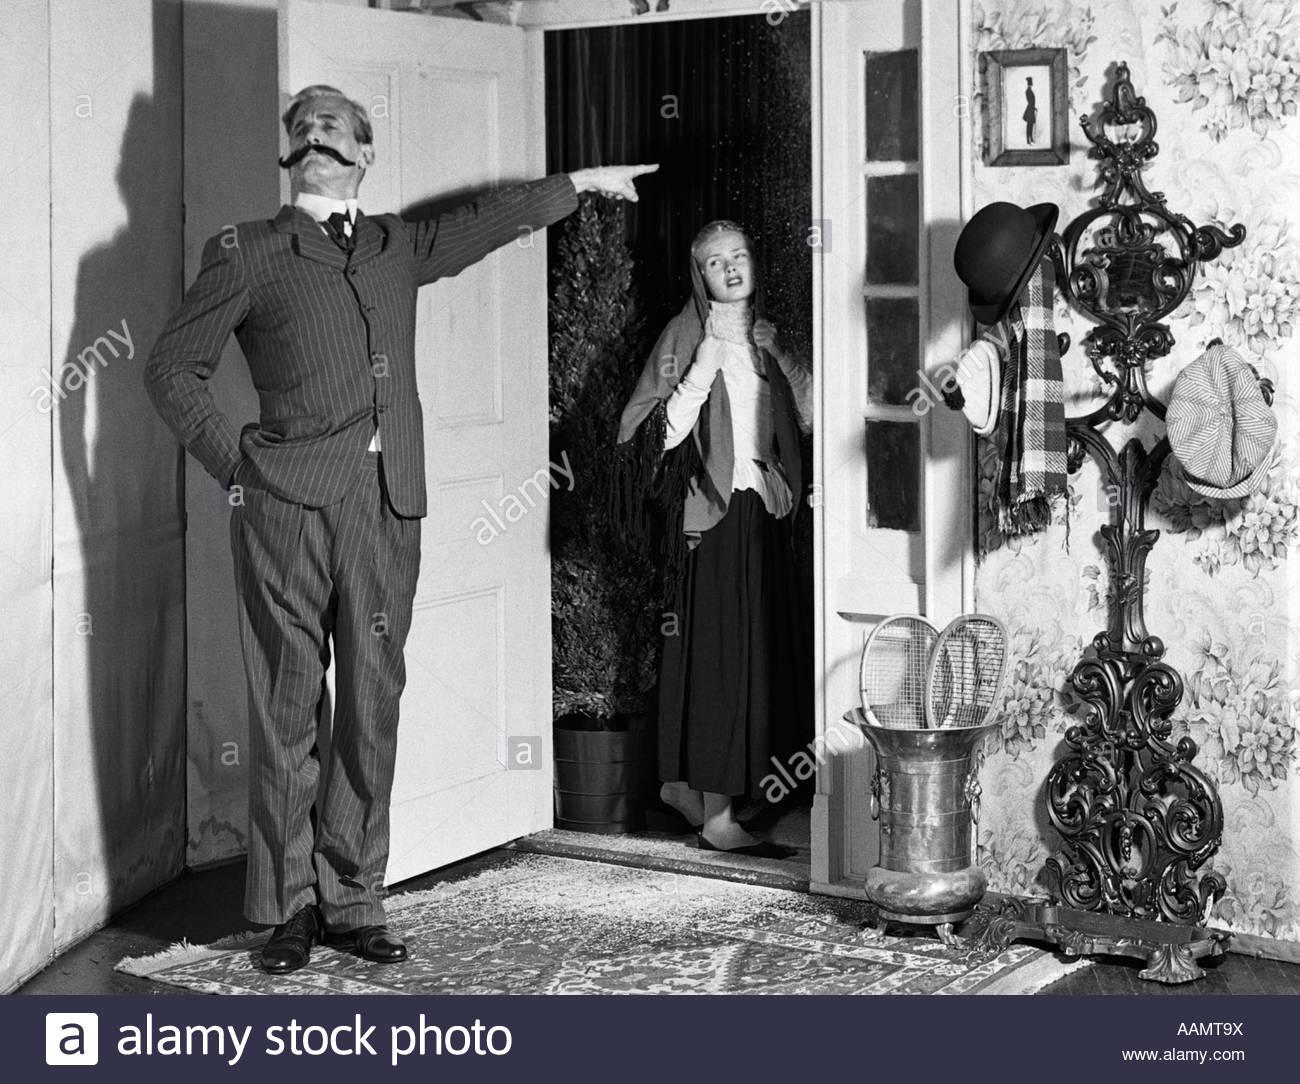 Victorian Man Stock Photos & Victorian Man Stock Images.